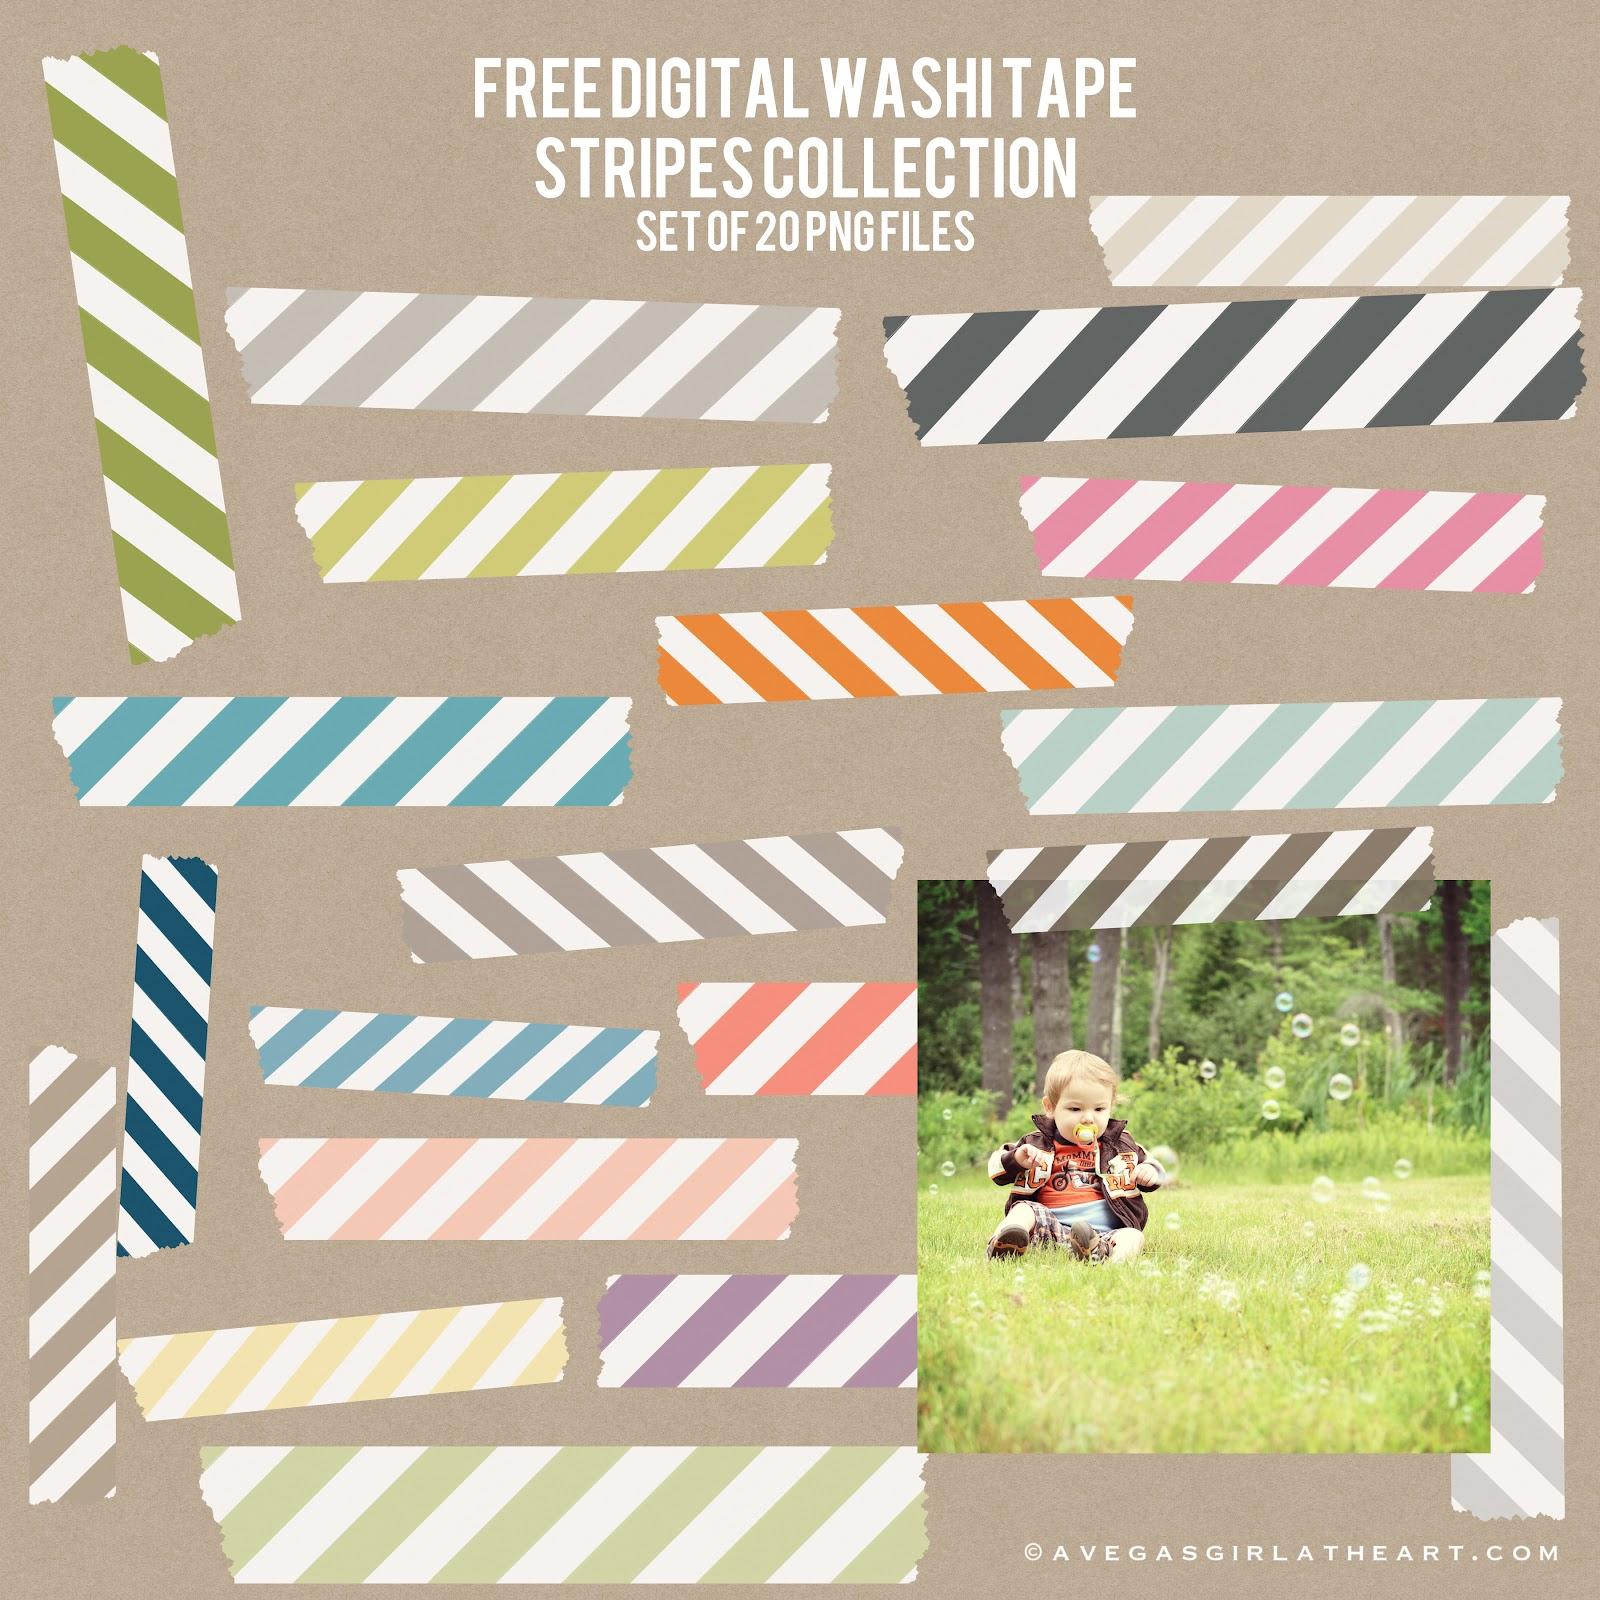 Washi Stripes Freebie Post Image